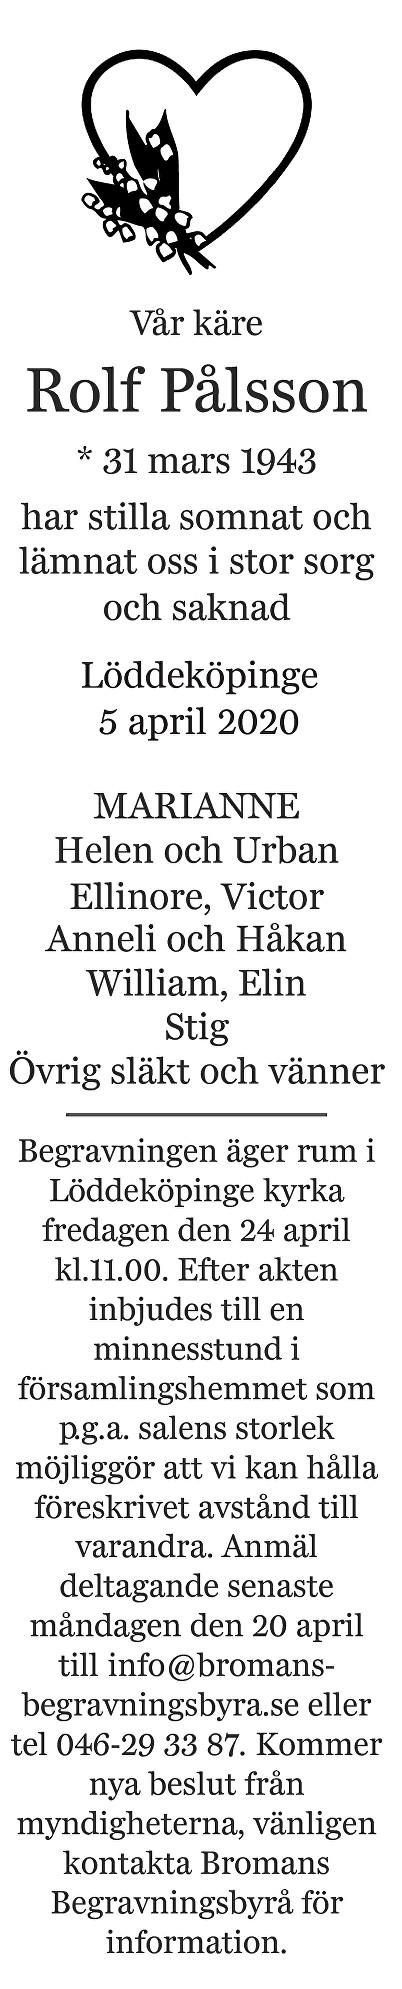 Rolf Pålsson Death notice